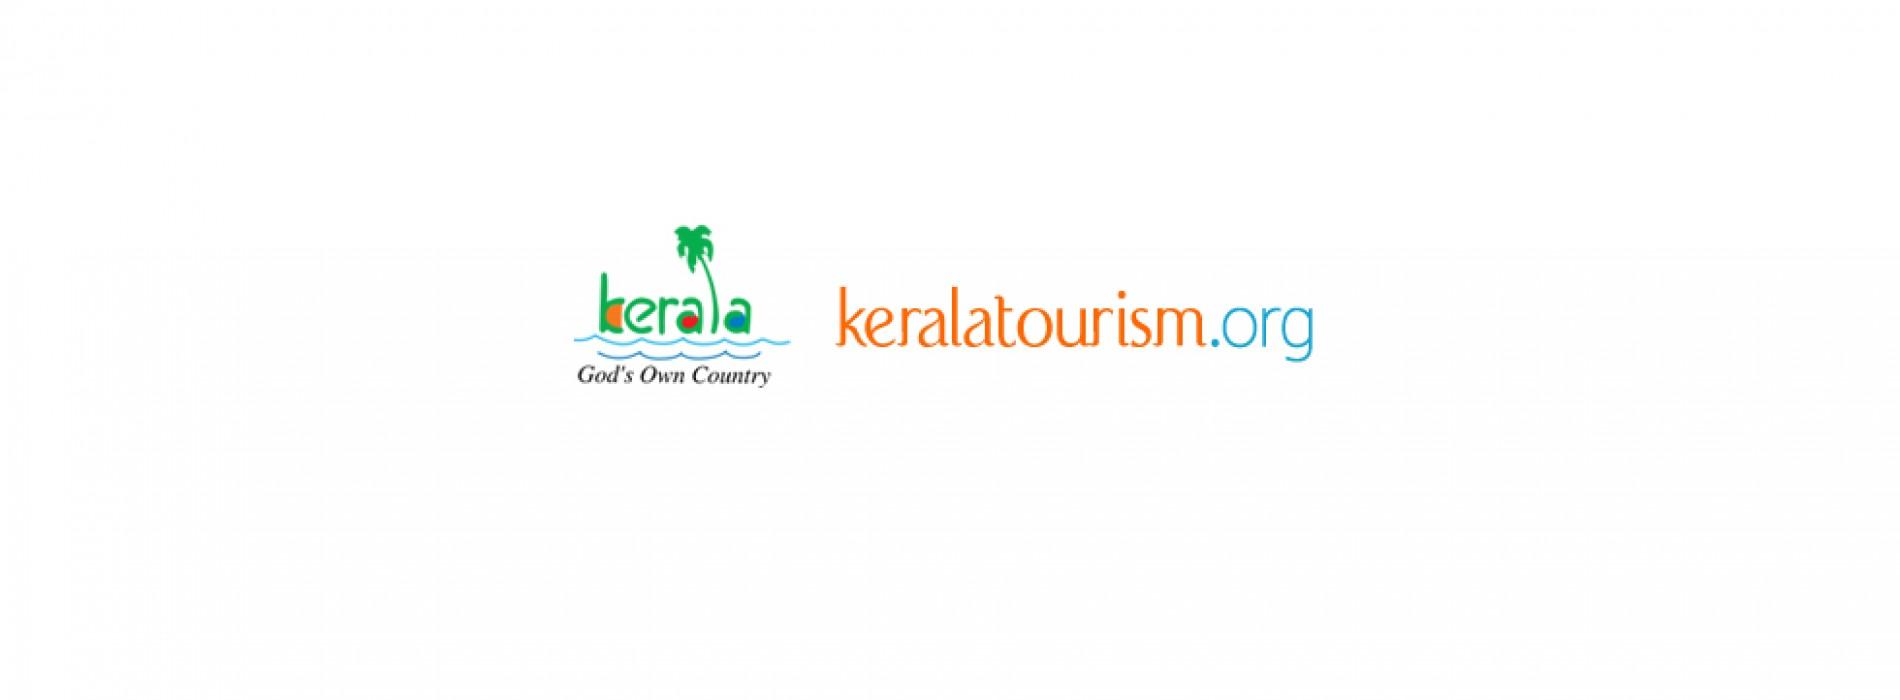 Kerala Tourism organises Carnatic Music Festival to woo tourists